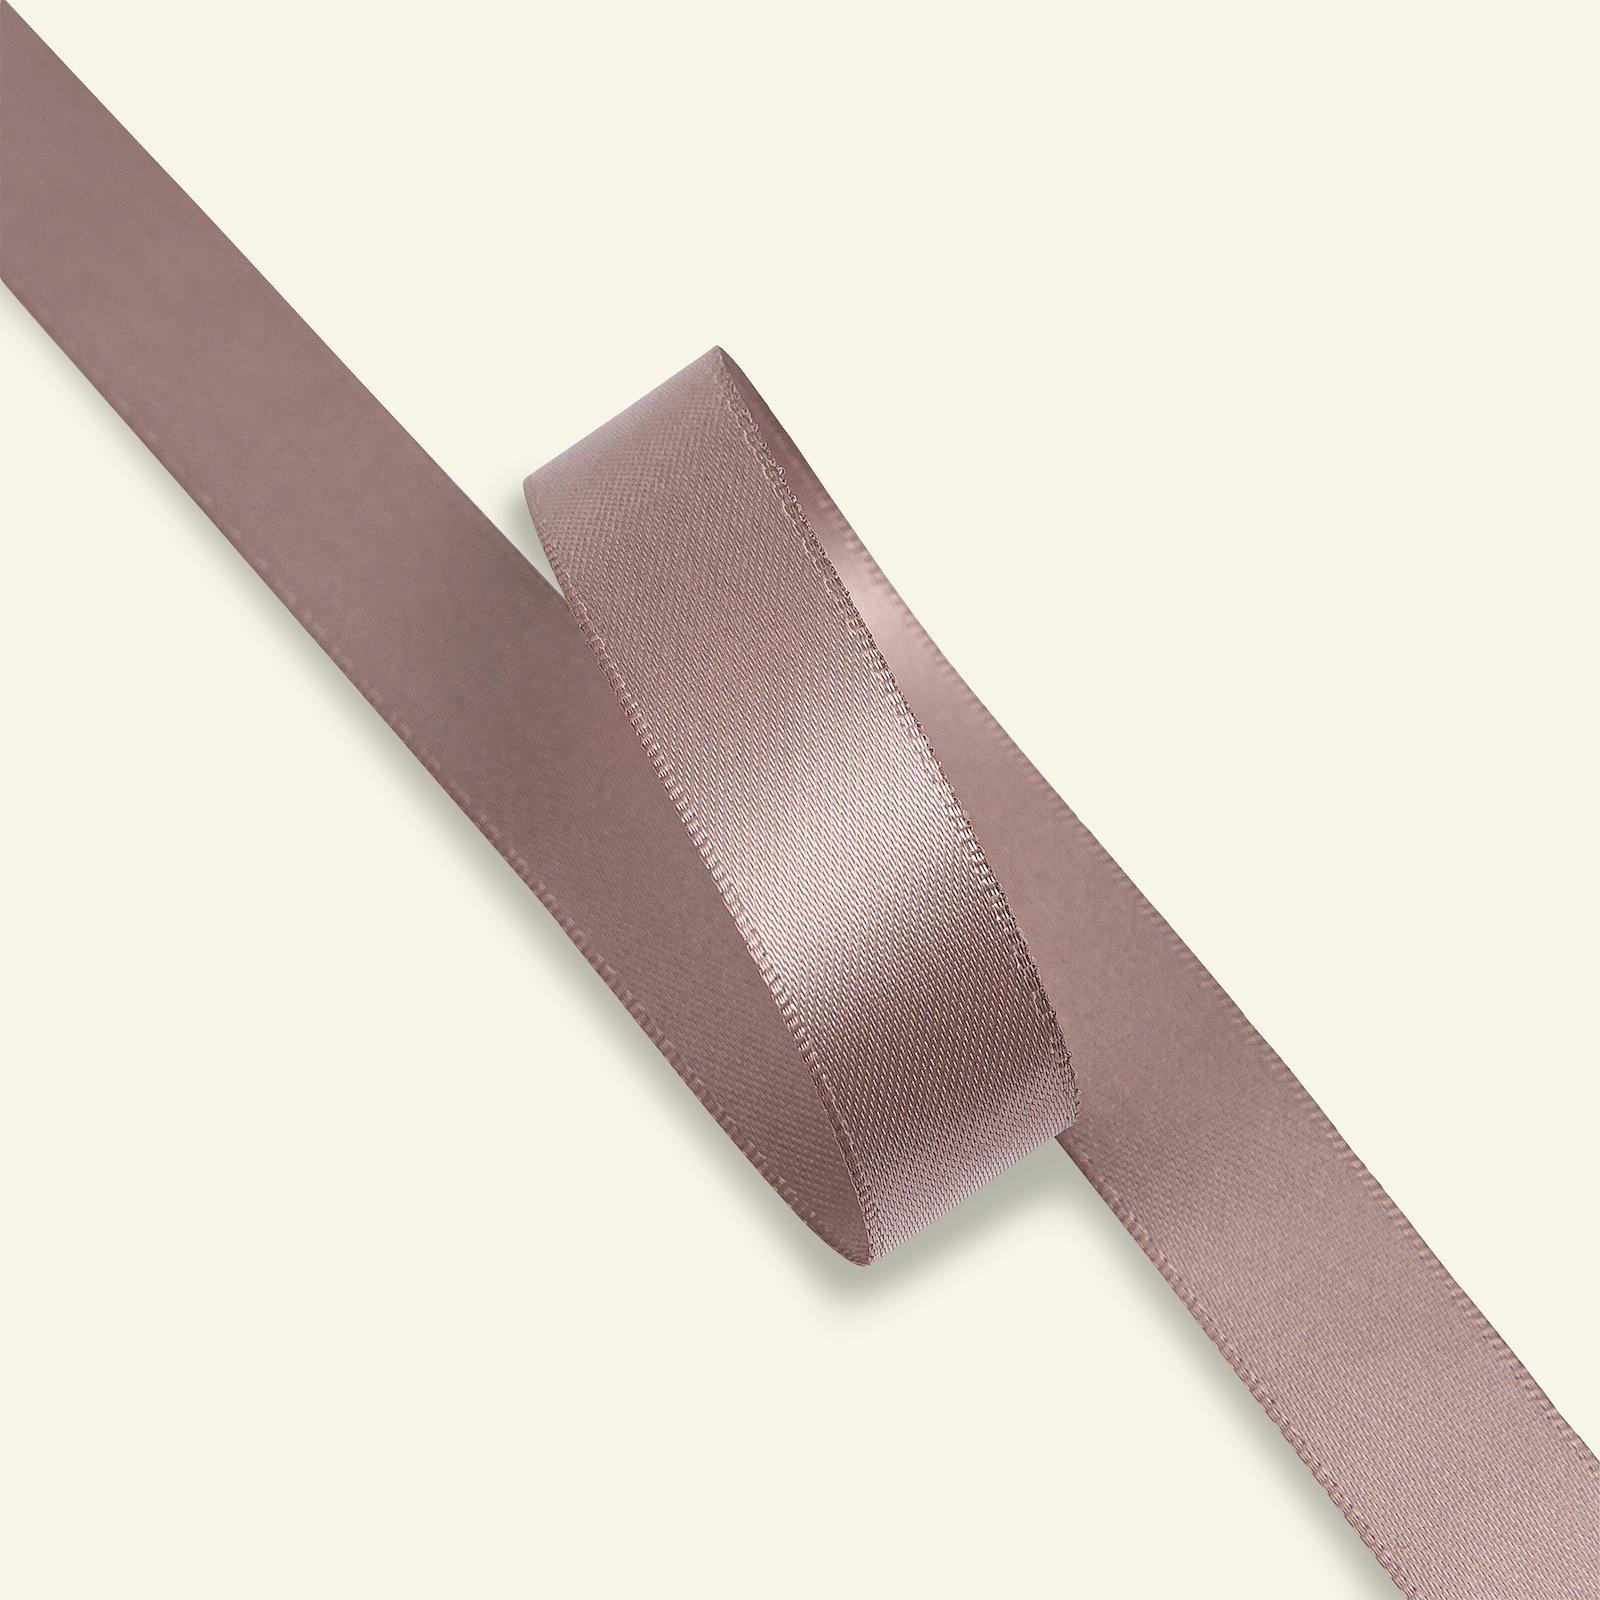 Satin ribbon 15mm light heather 25m 27377_pack